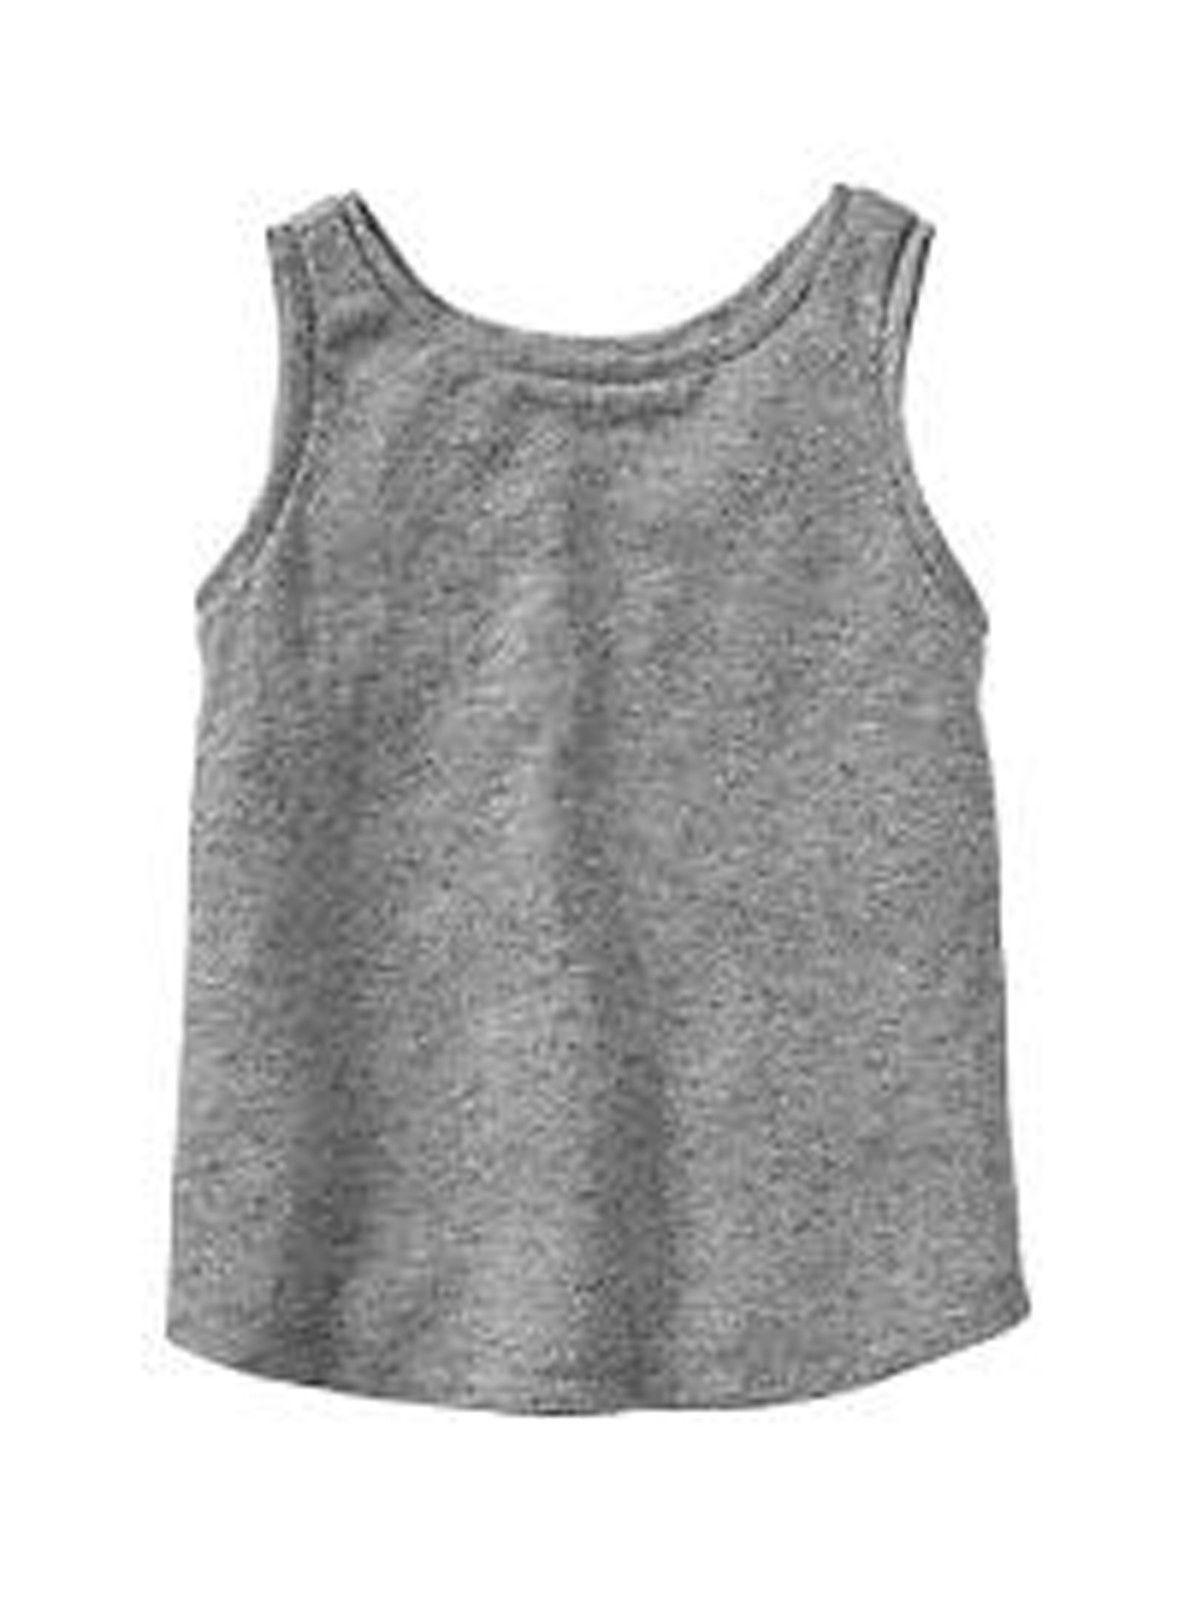 GAP Kids Girls Tank Top Tee  Sz M 8 Marled Slub Sleeveless Grey Rugged Knit New